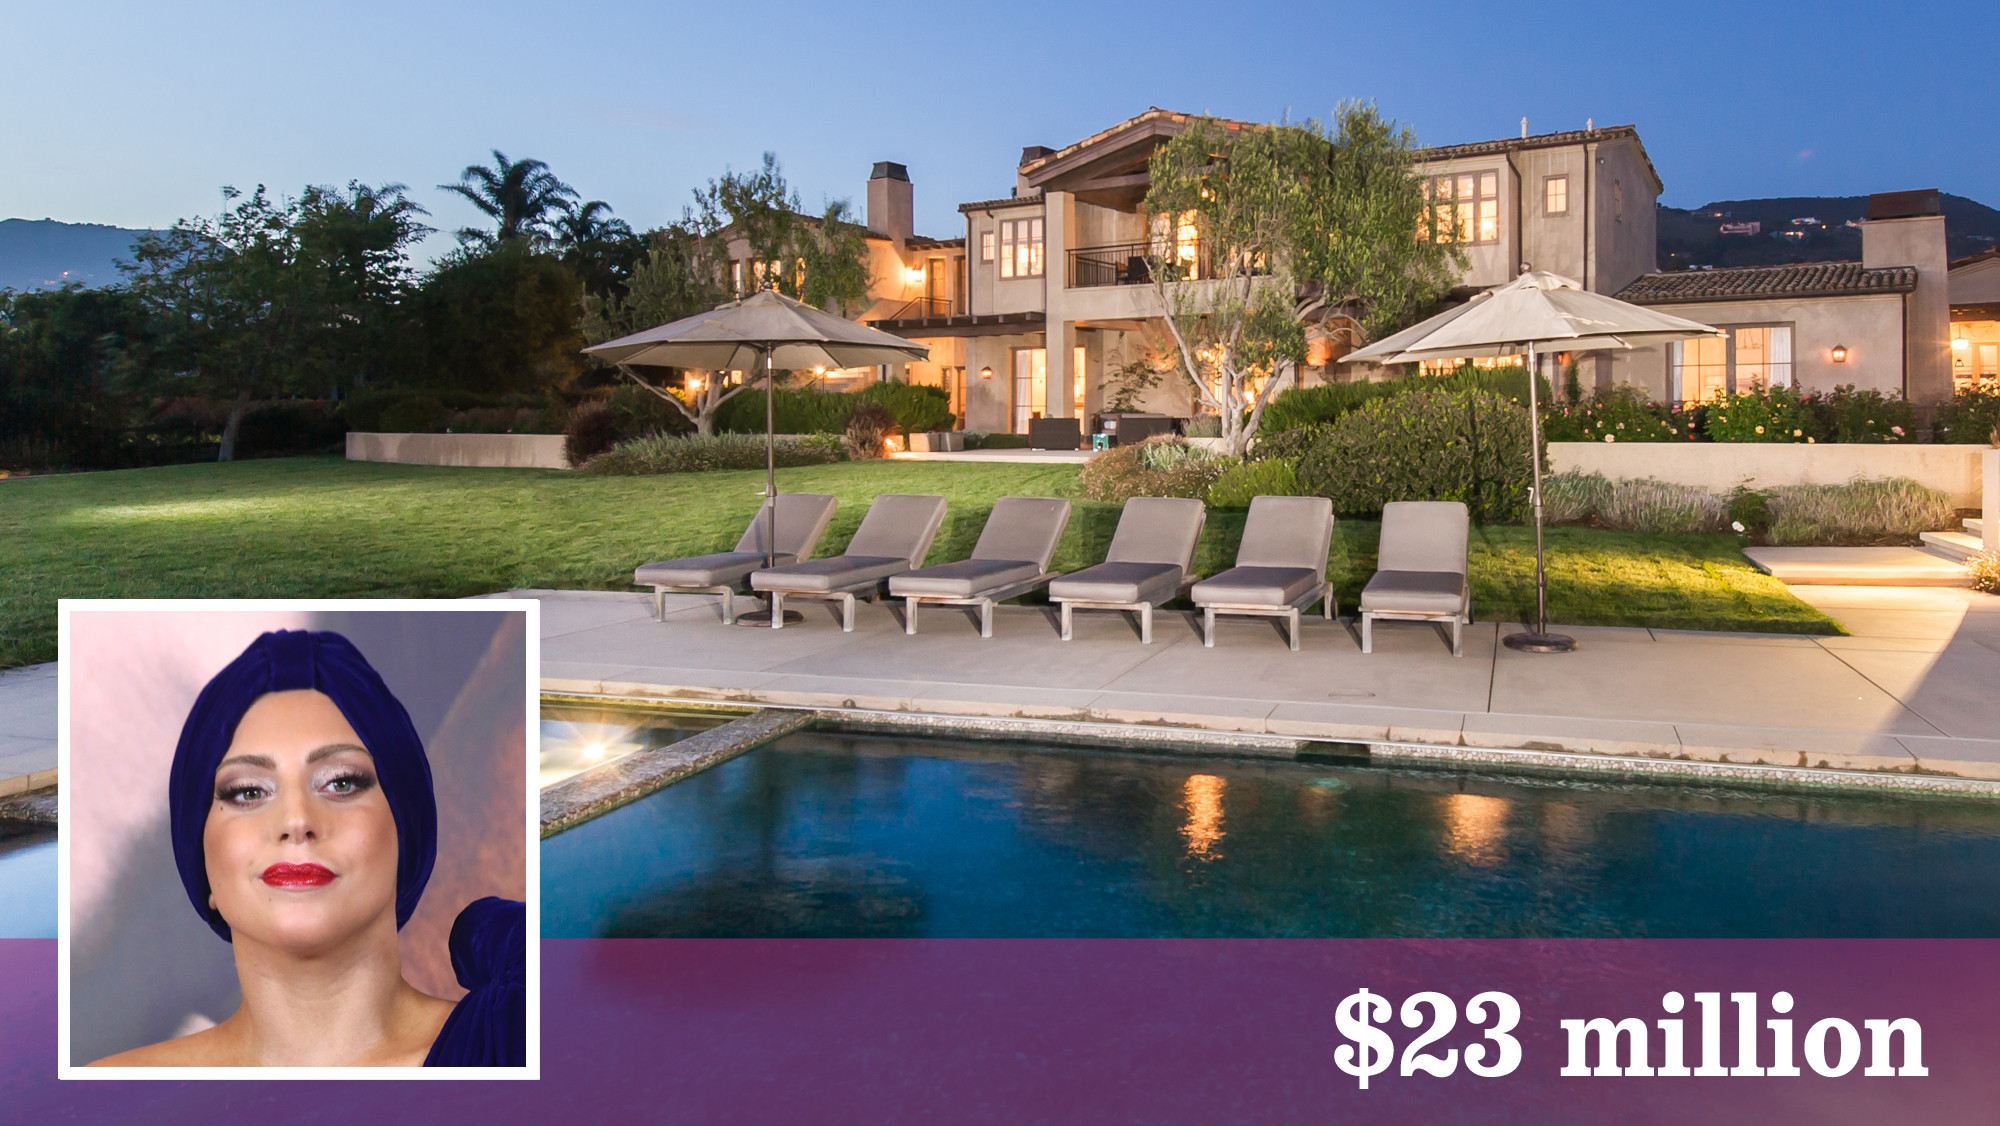 Lady Gaga Buys 23 Million Malibu Estate With Stables